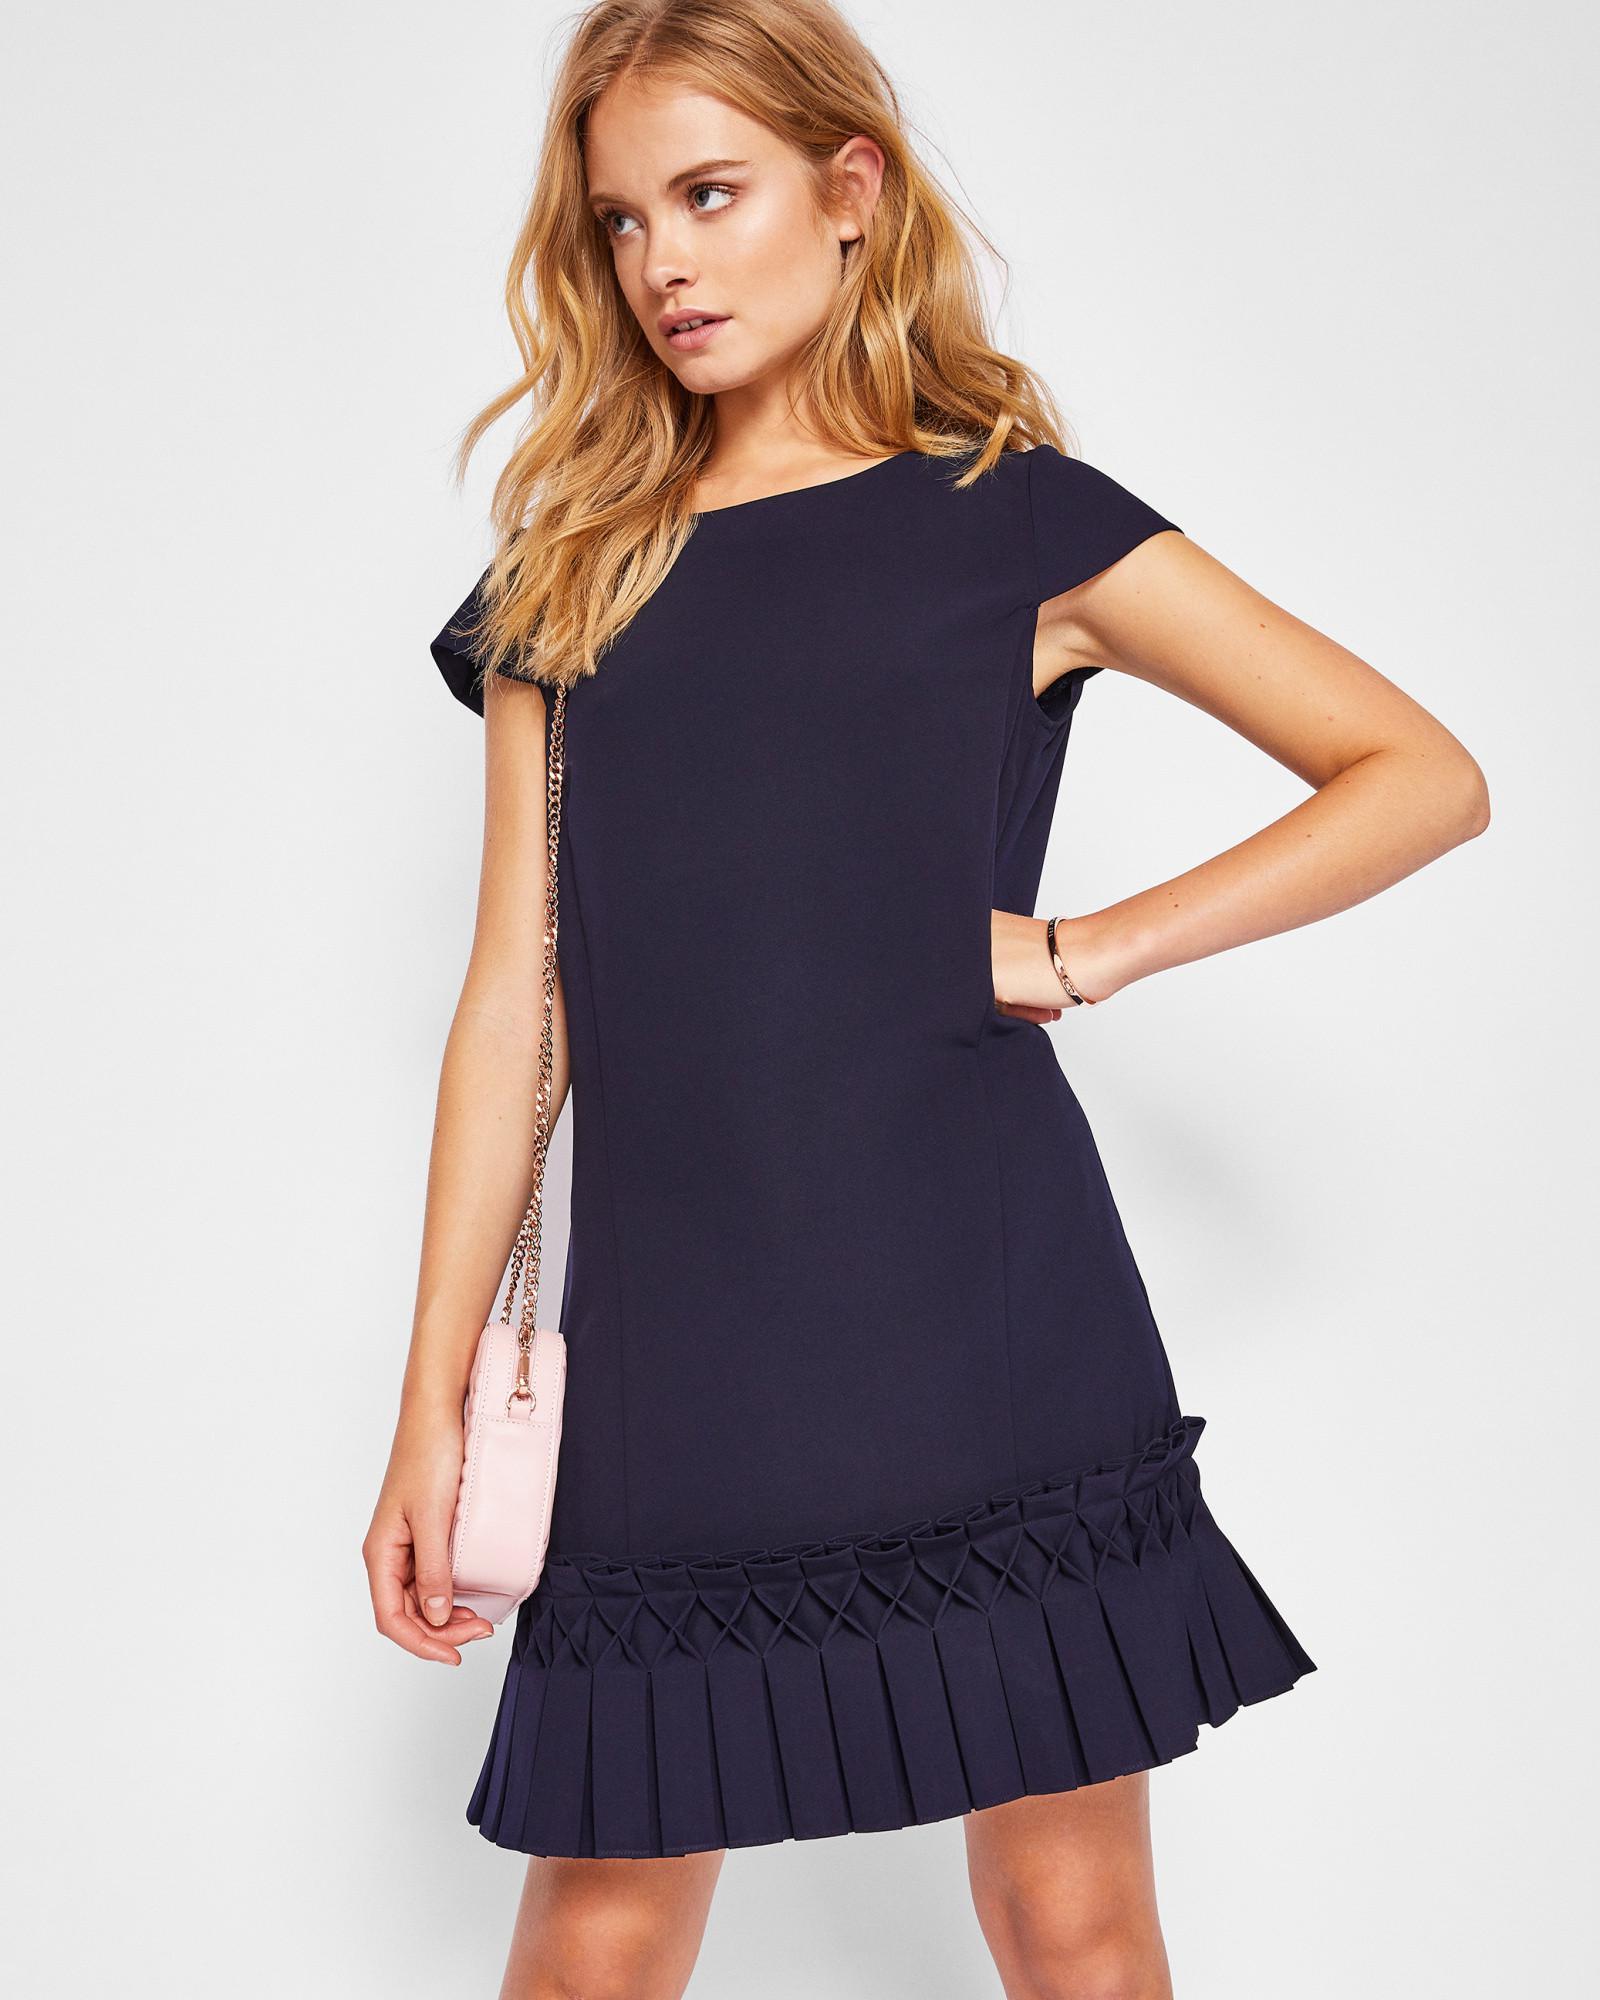 4f953aec63 Ted Baker Abana Dropped Waist Pleated Skirt Dress